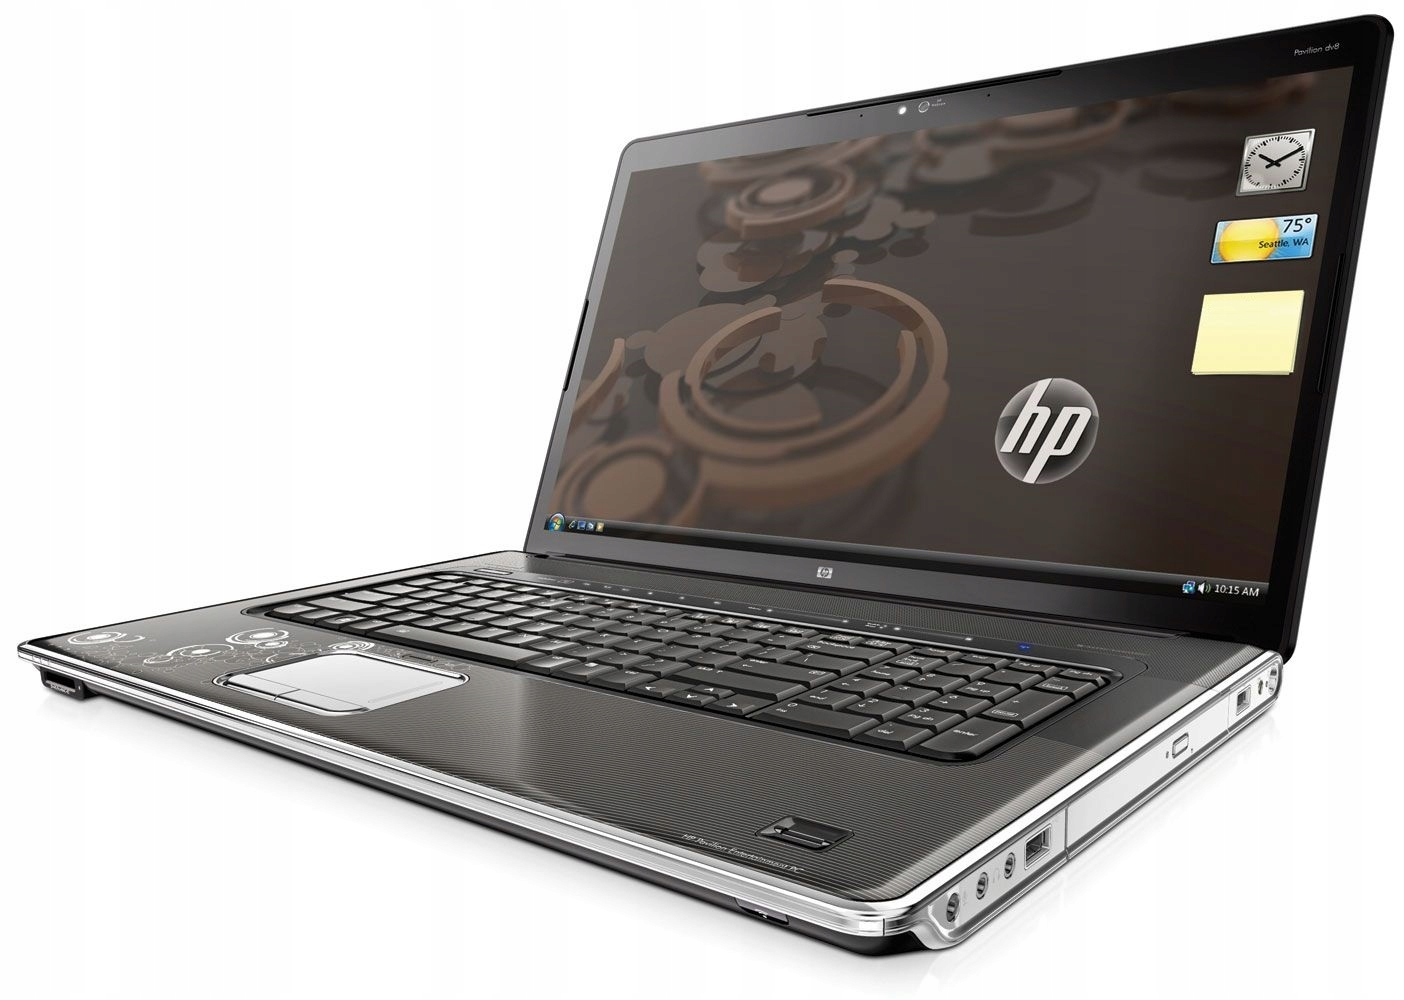 BATERIA AKUMULATOR HP PAVILION DV7 DV8 HDX X18 - Baterie do laptopów